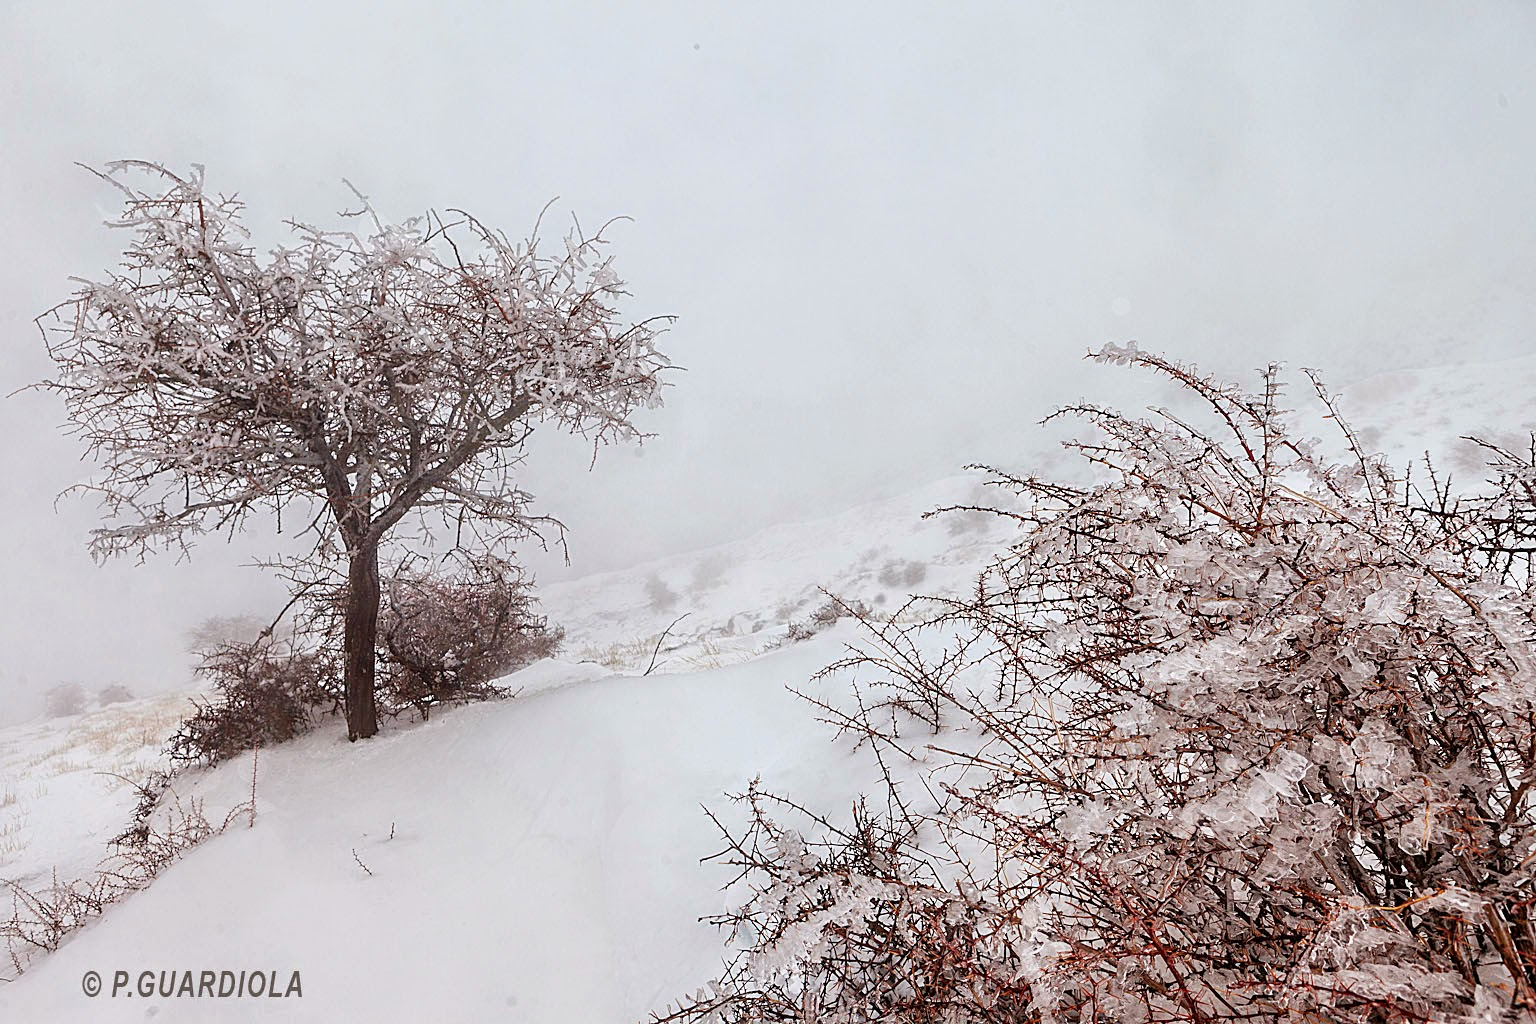 Nieve a una altitud de 1858 m.